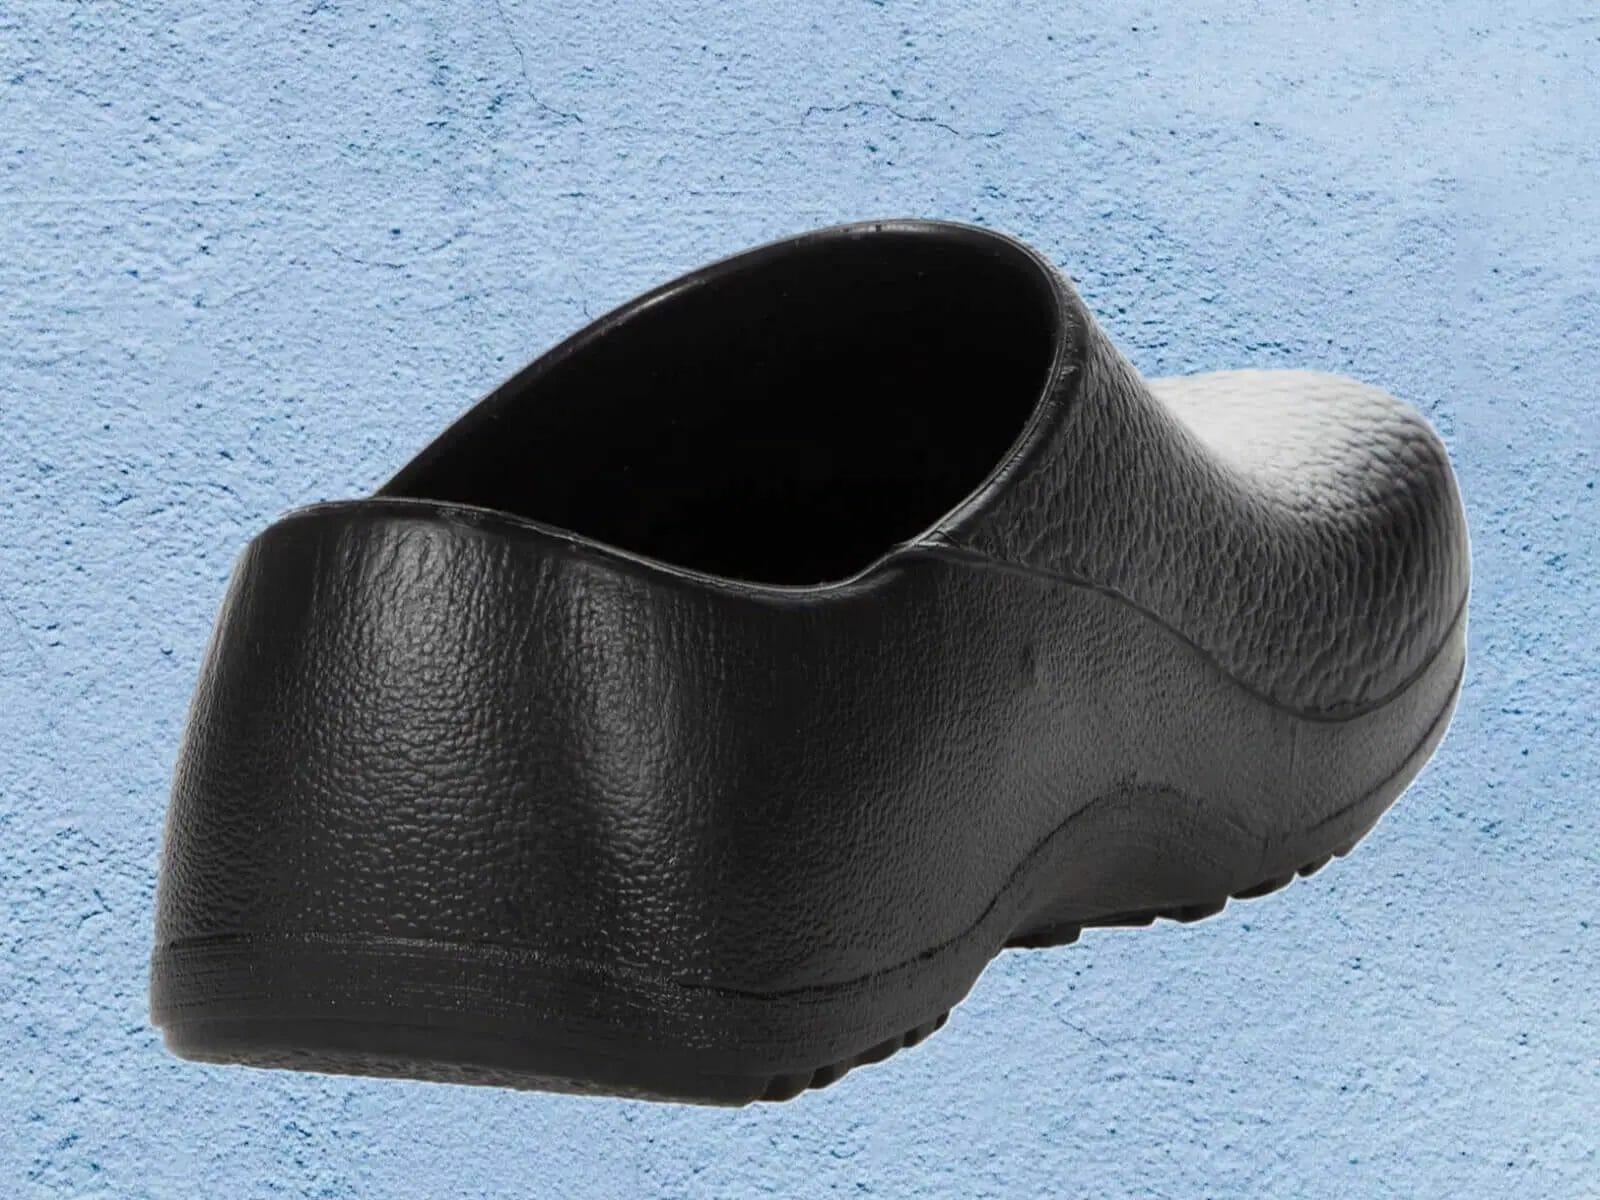 Details of the exterior rear heel of the birkenstock professional